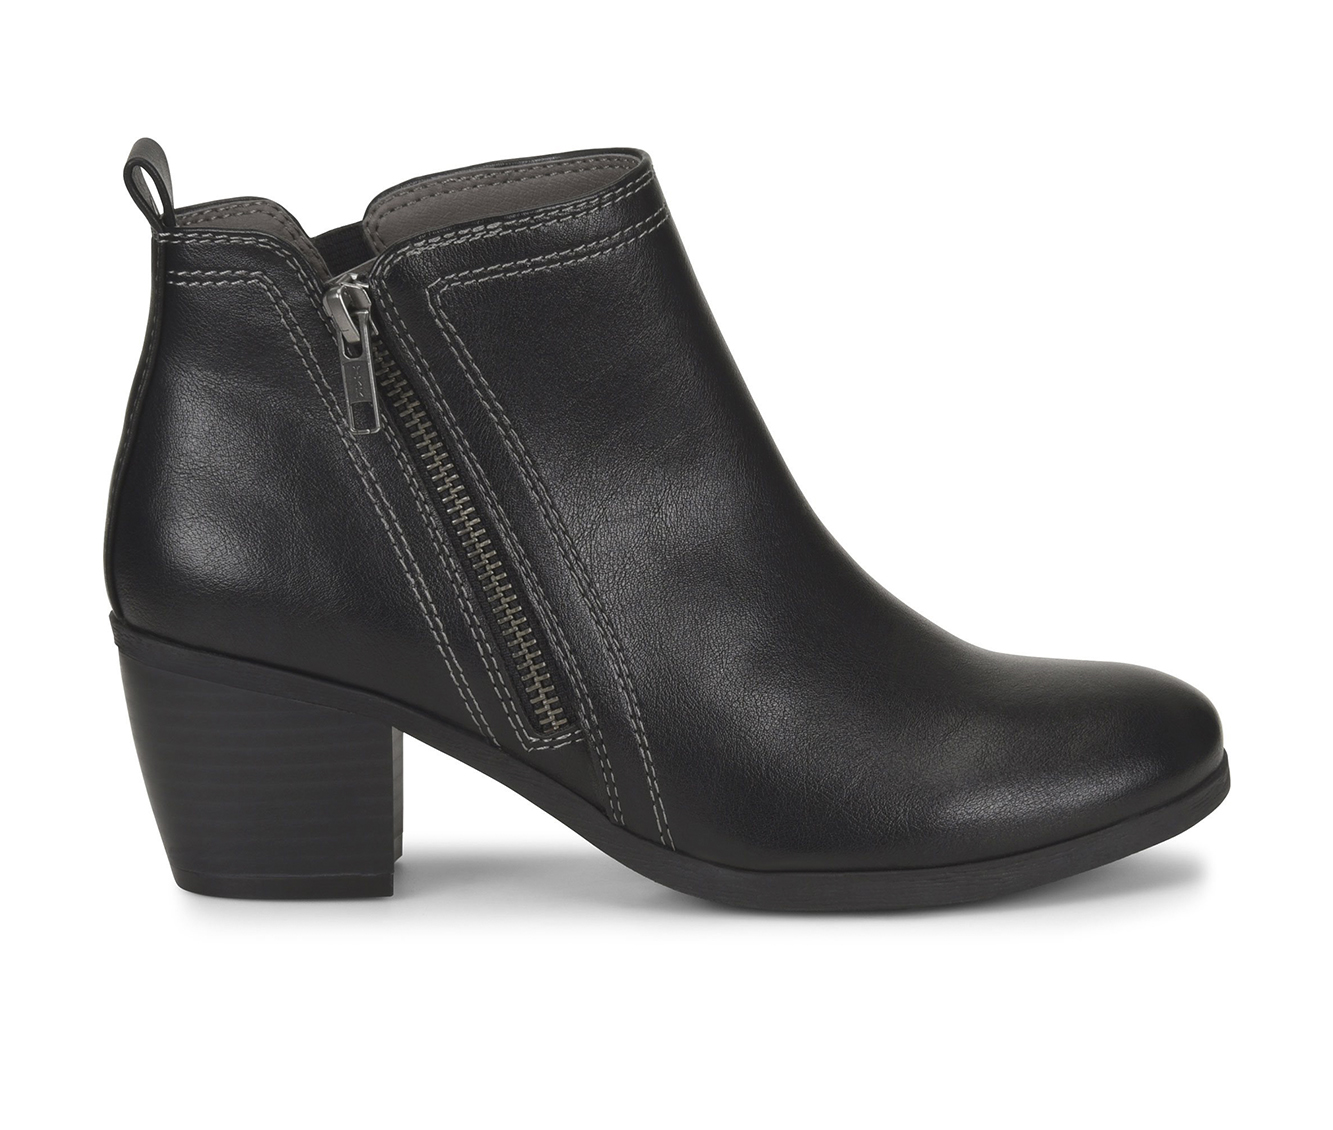 EuroSoft Adona Women's Boots (Black - Faux Leather)